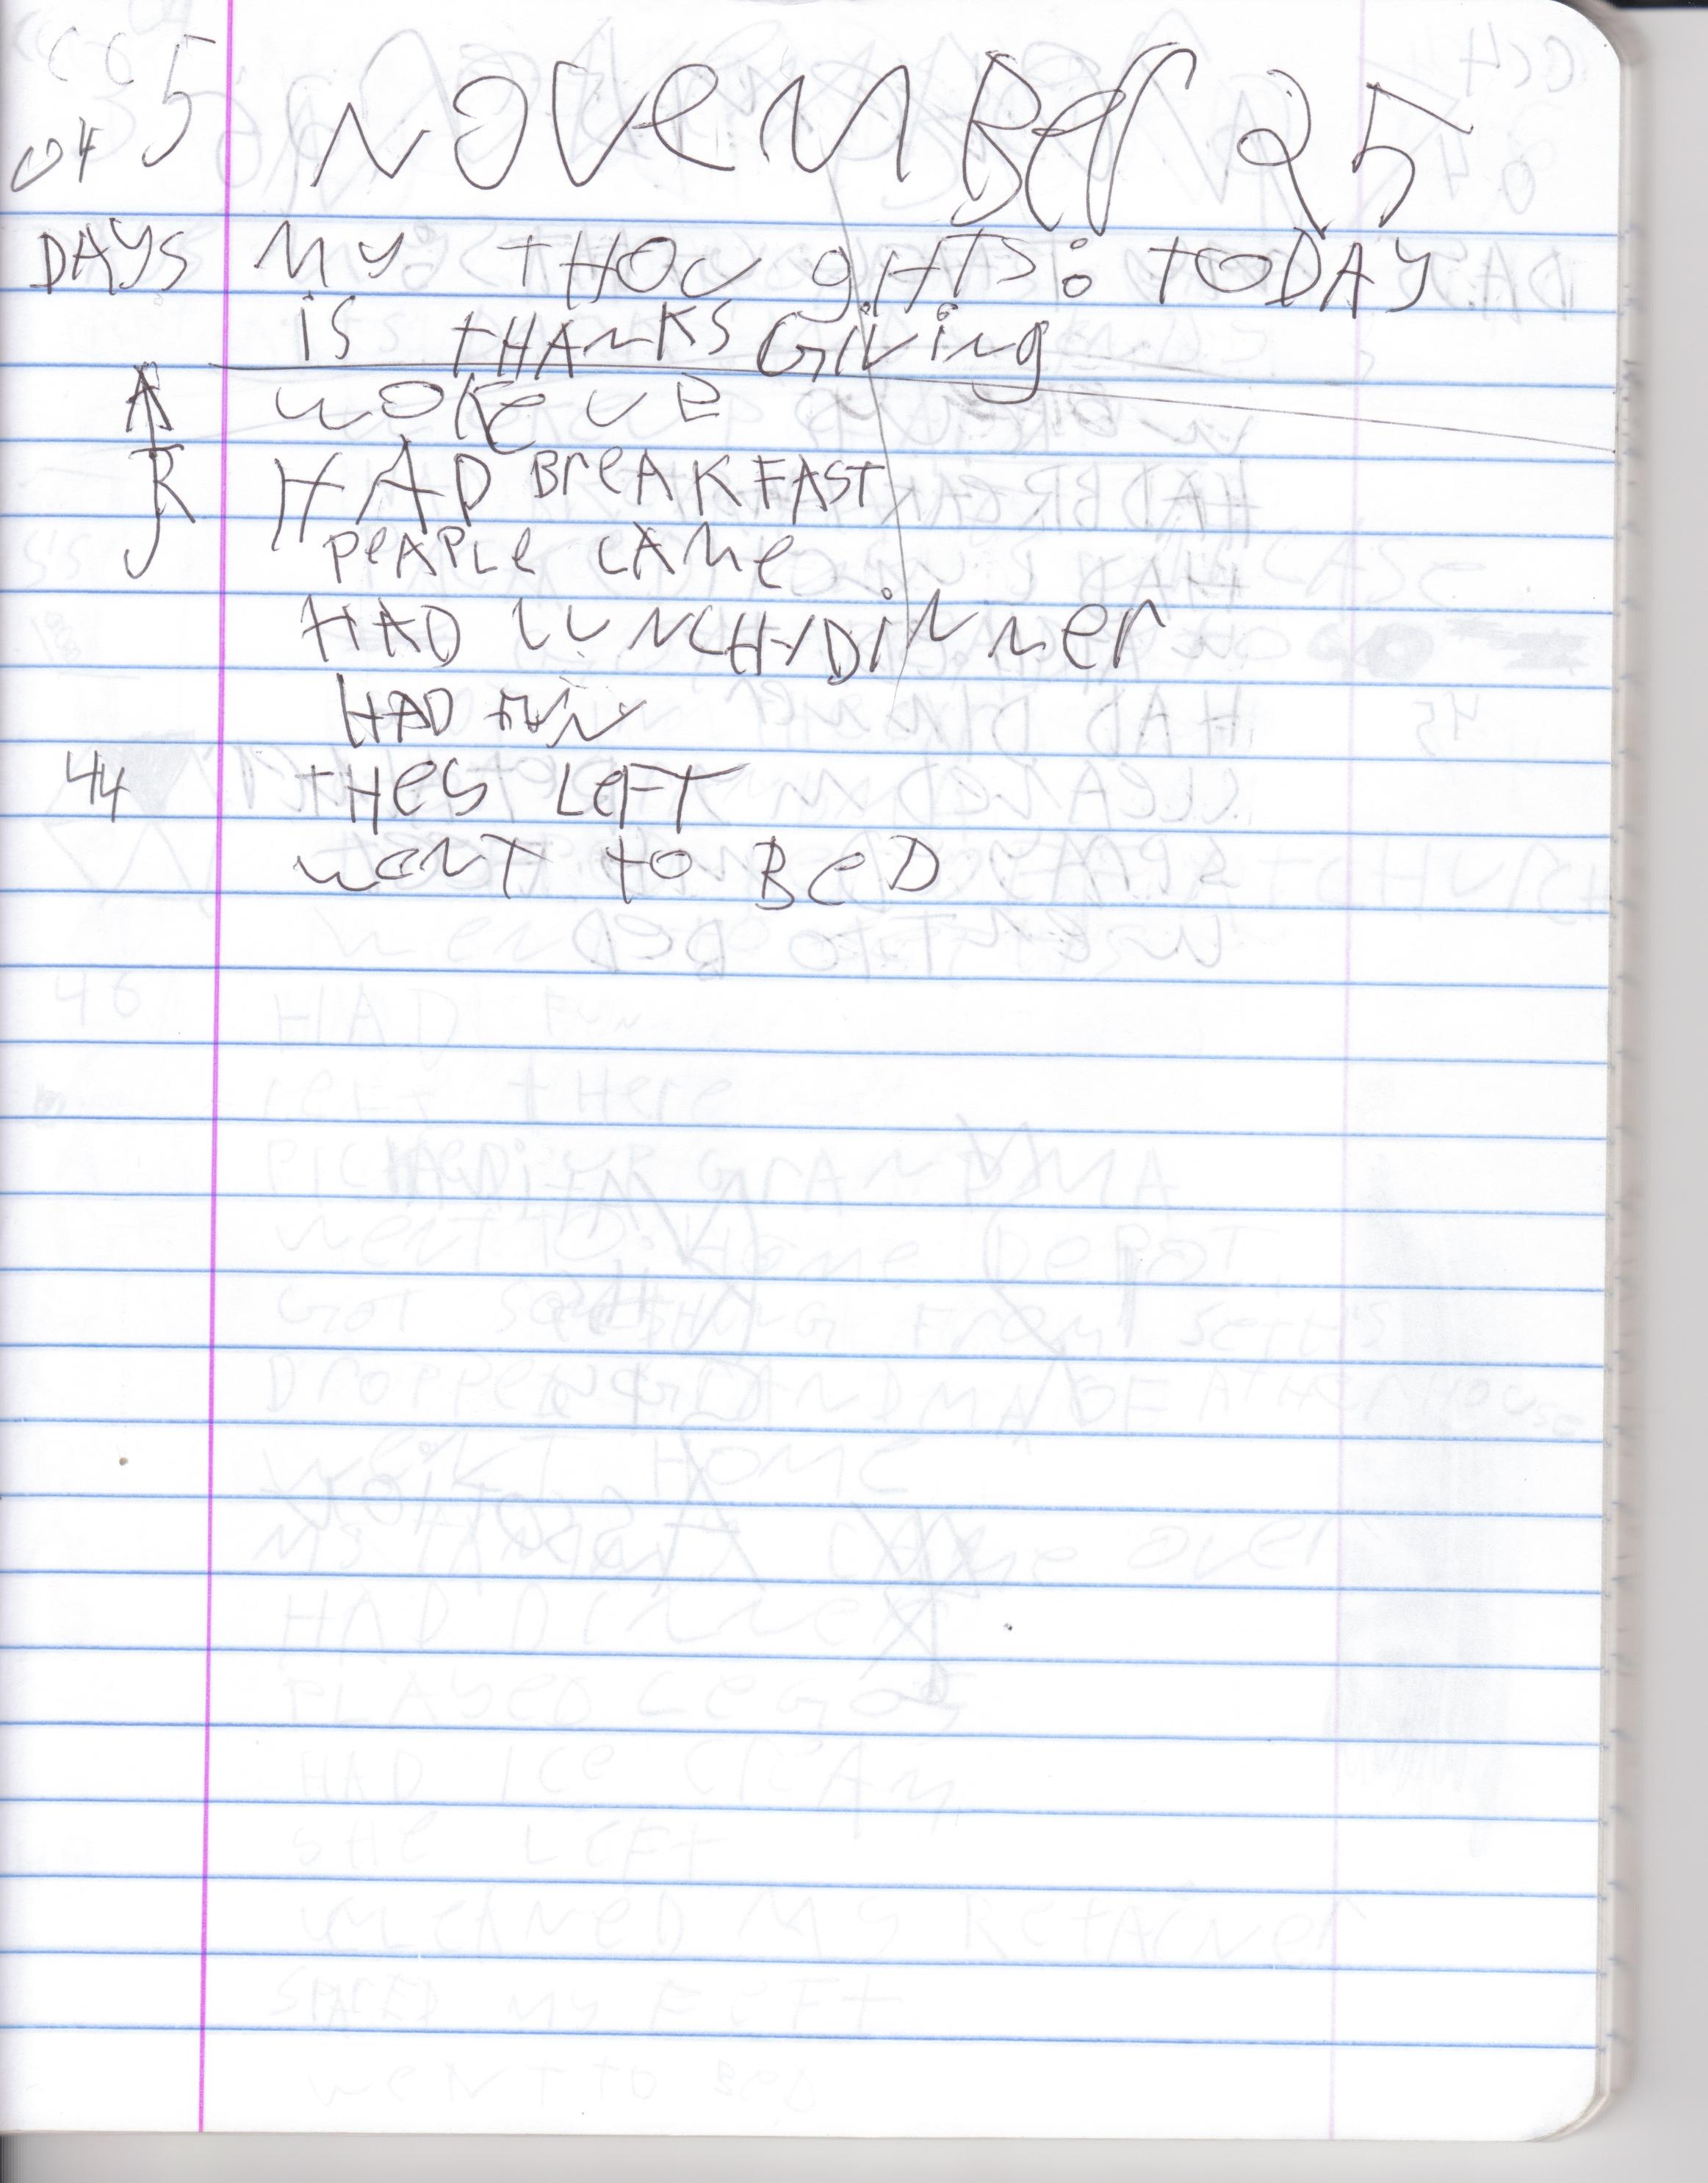 my first diary-log_Page_047.jpg